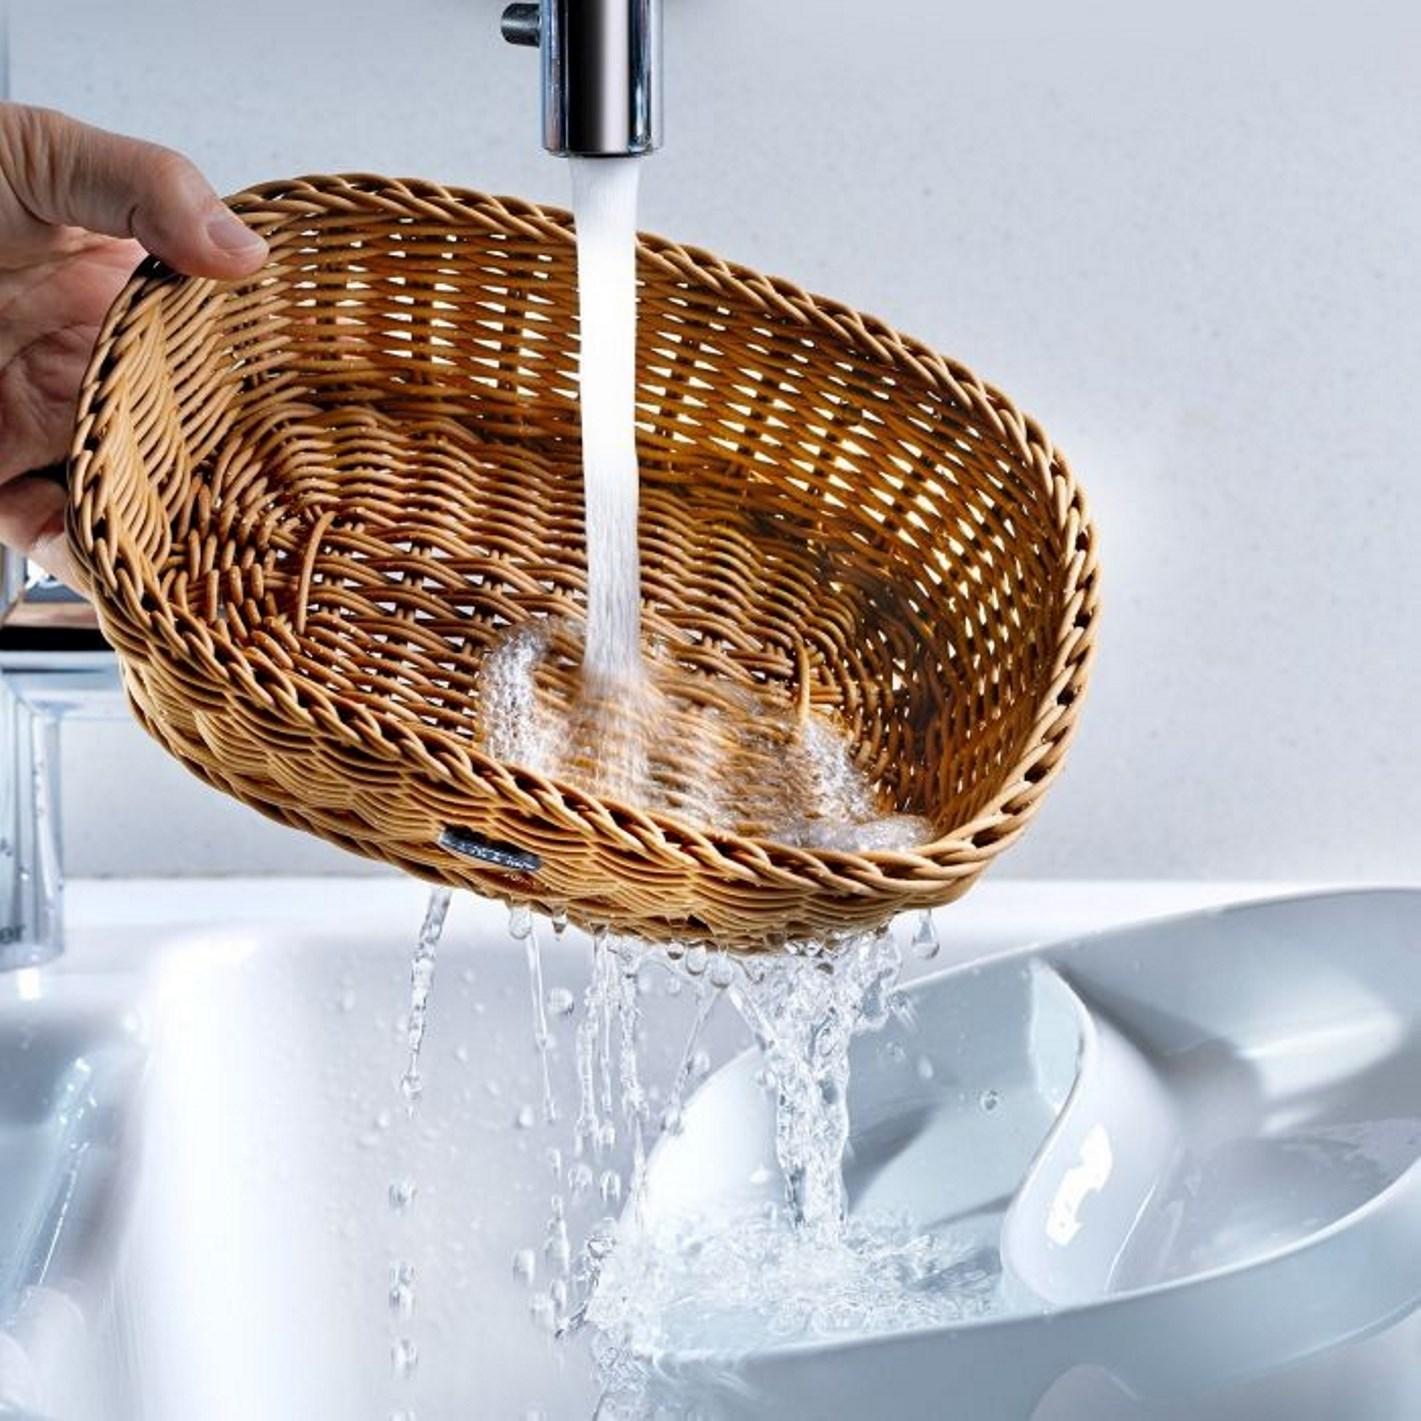 Корзина овальная Saleen, 23,5х18х8 см, белый Saleen 02096110101 фото 3